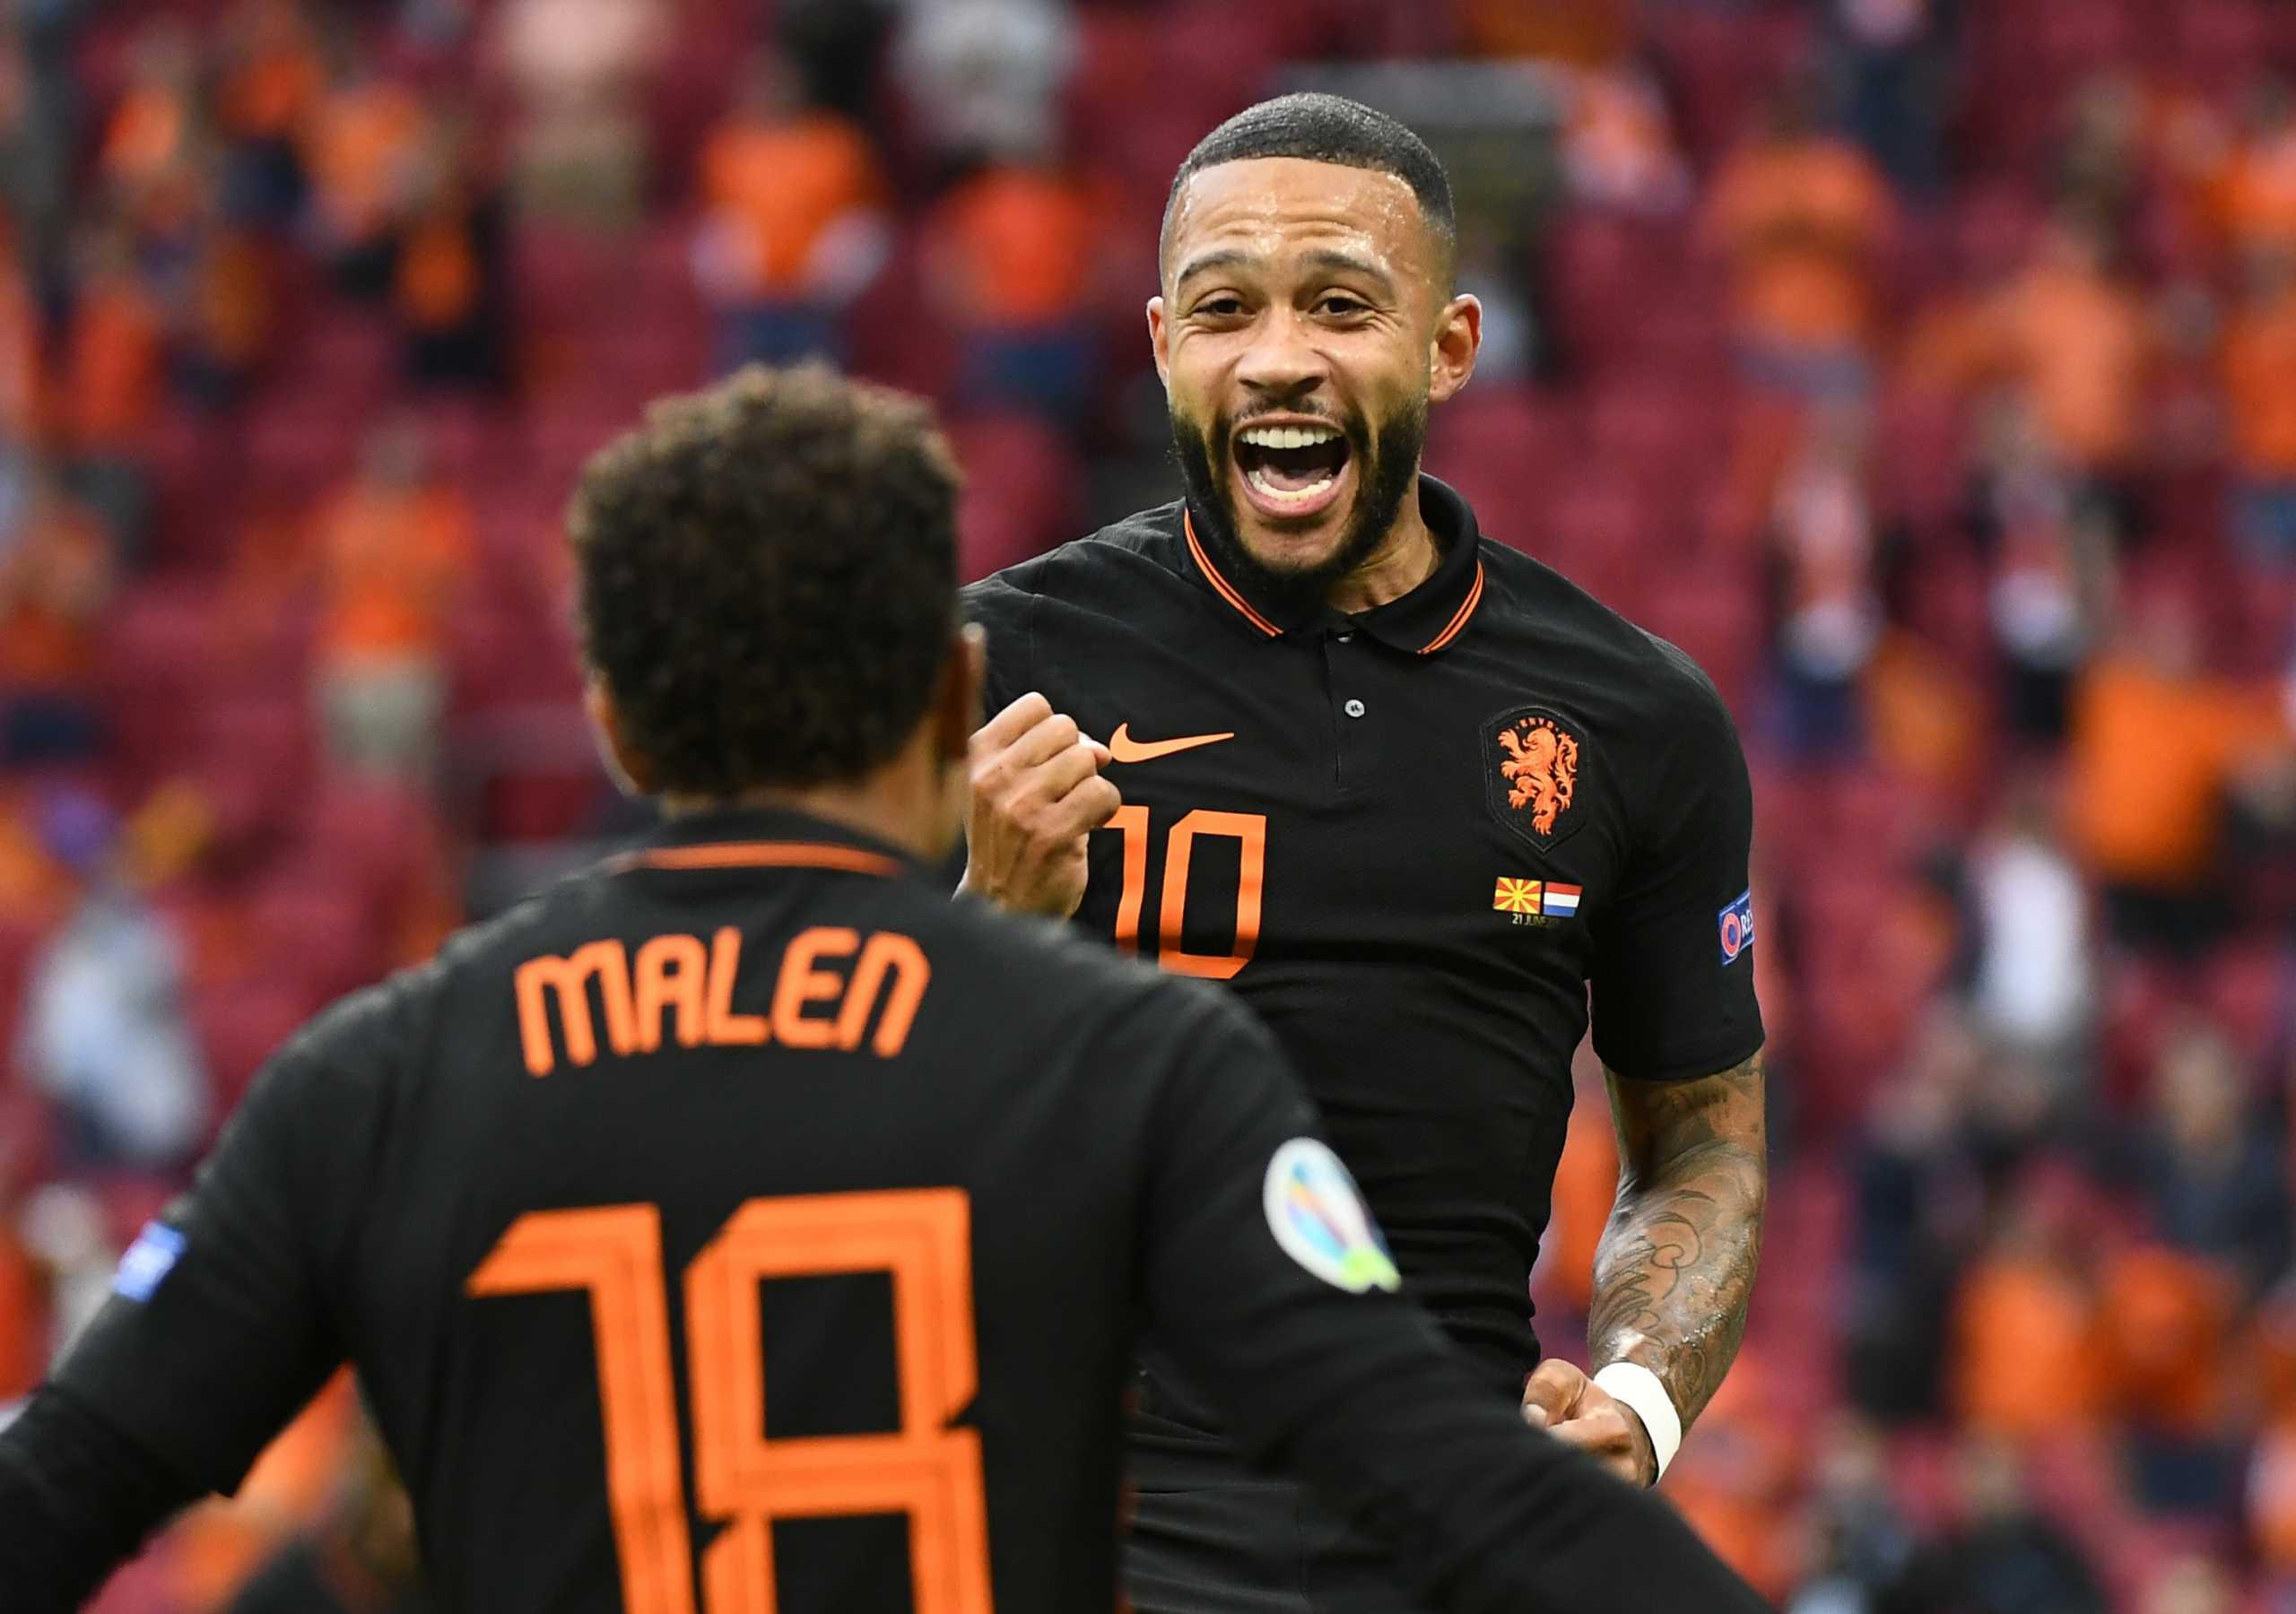 Euro 2020, Βόρεια Μακεδονία – Ολλανδία: Συνεργασία Ντεπάι – Μαλέν και γκολ «ποίημα»